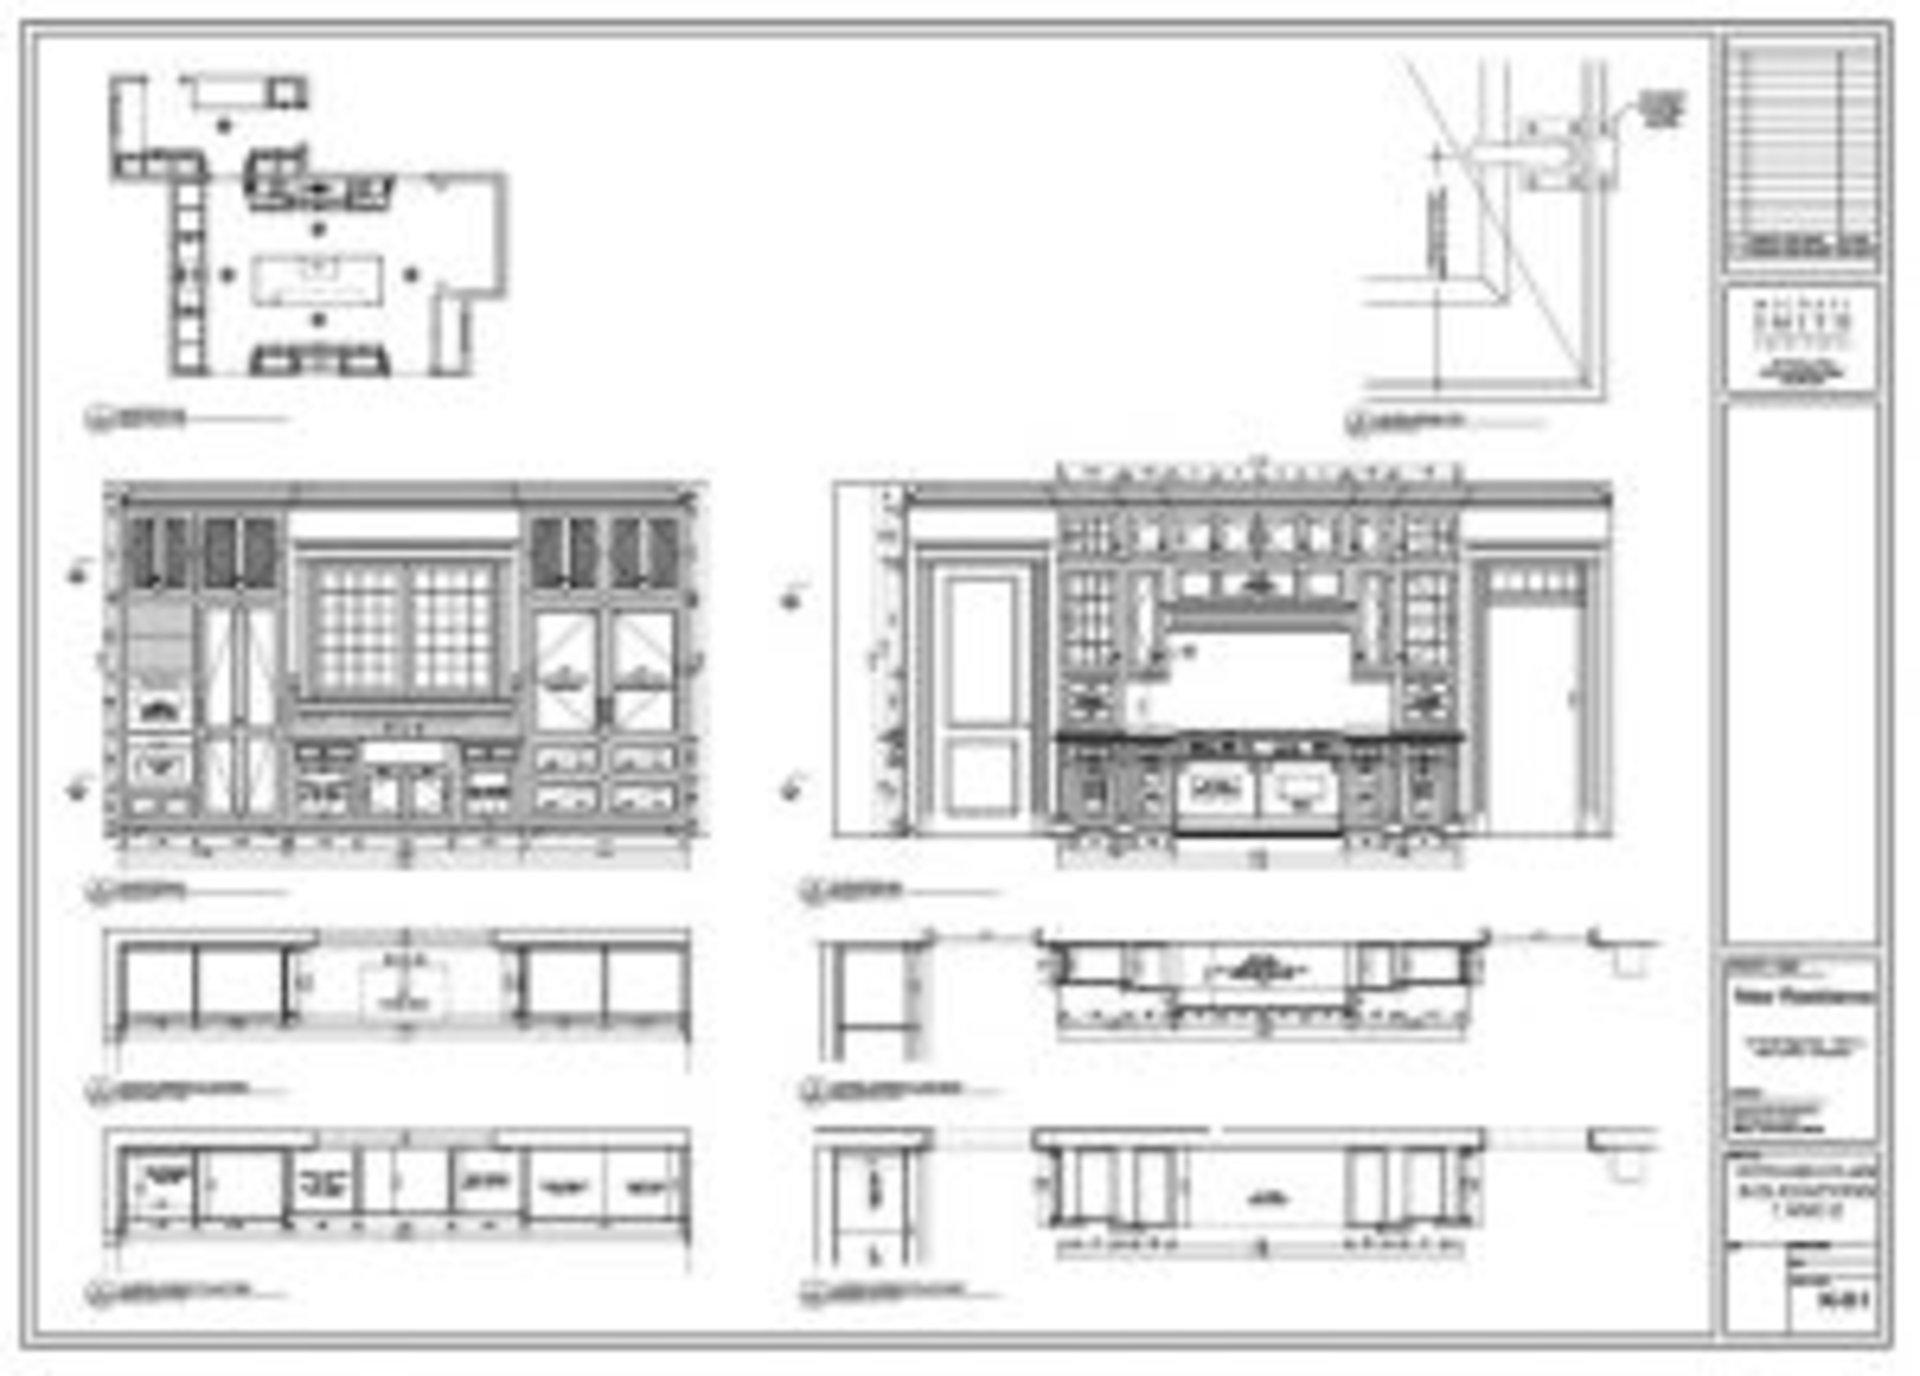 Cabinetry & Built-ins Design